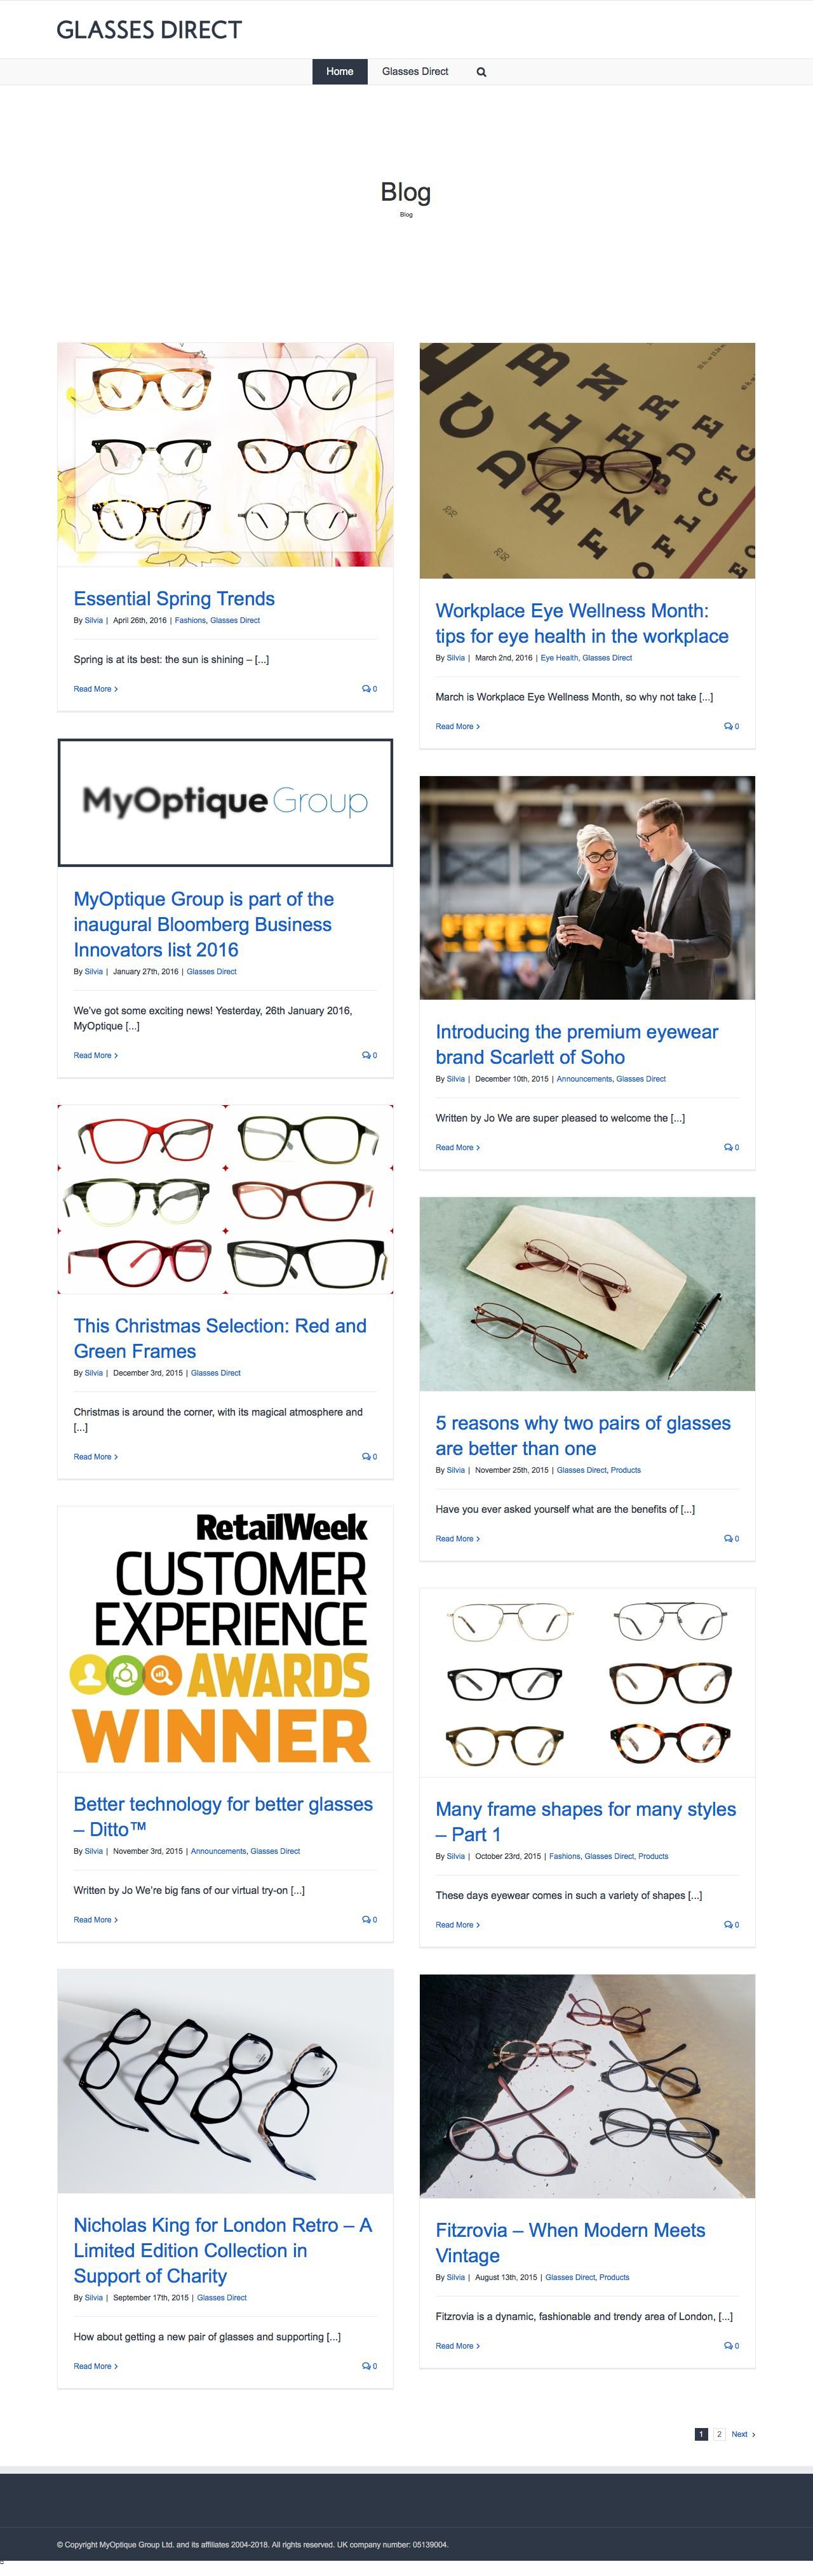 Screenshot of glassesdirect.co.uk - Glasses Direct ™ Blog - captured March 4, 2018